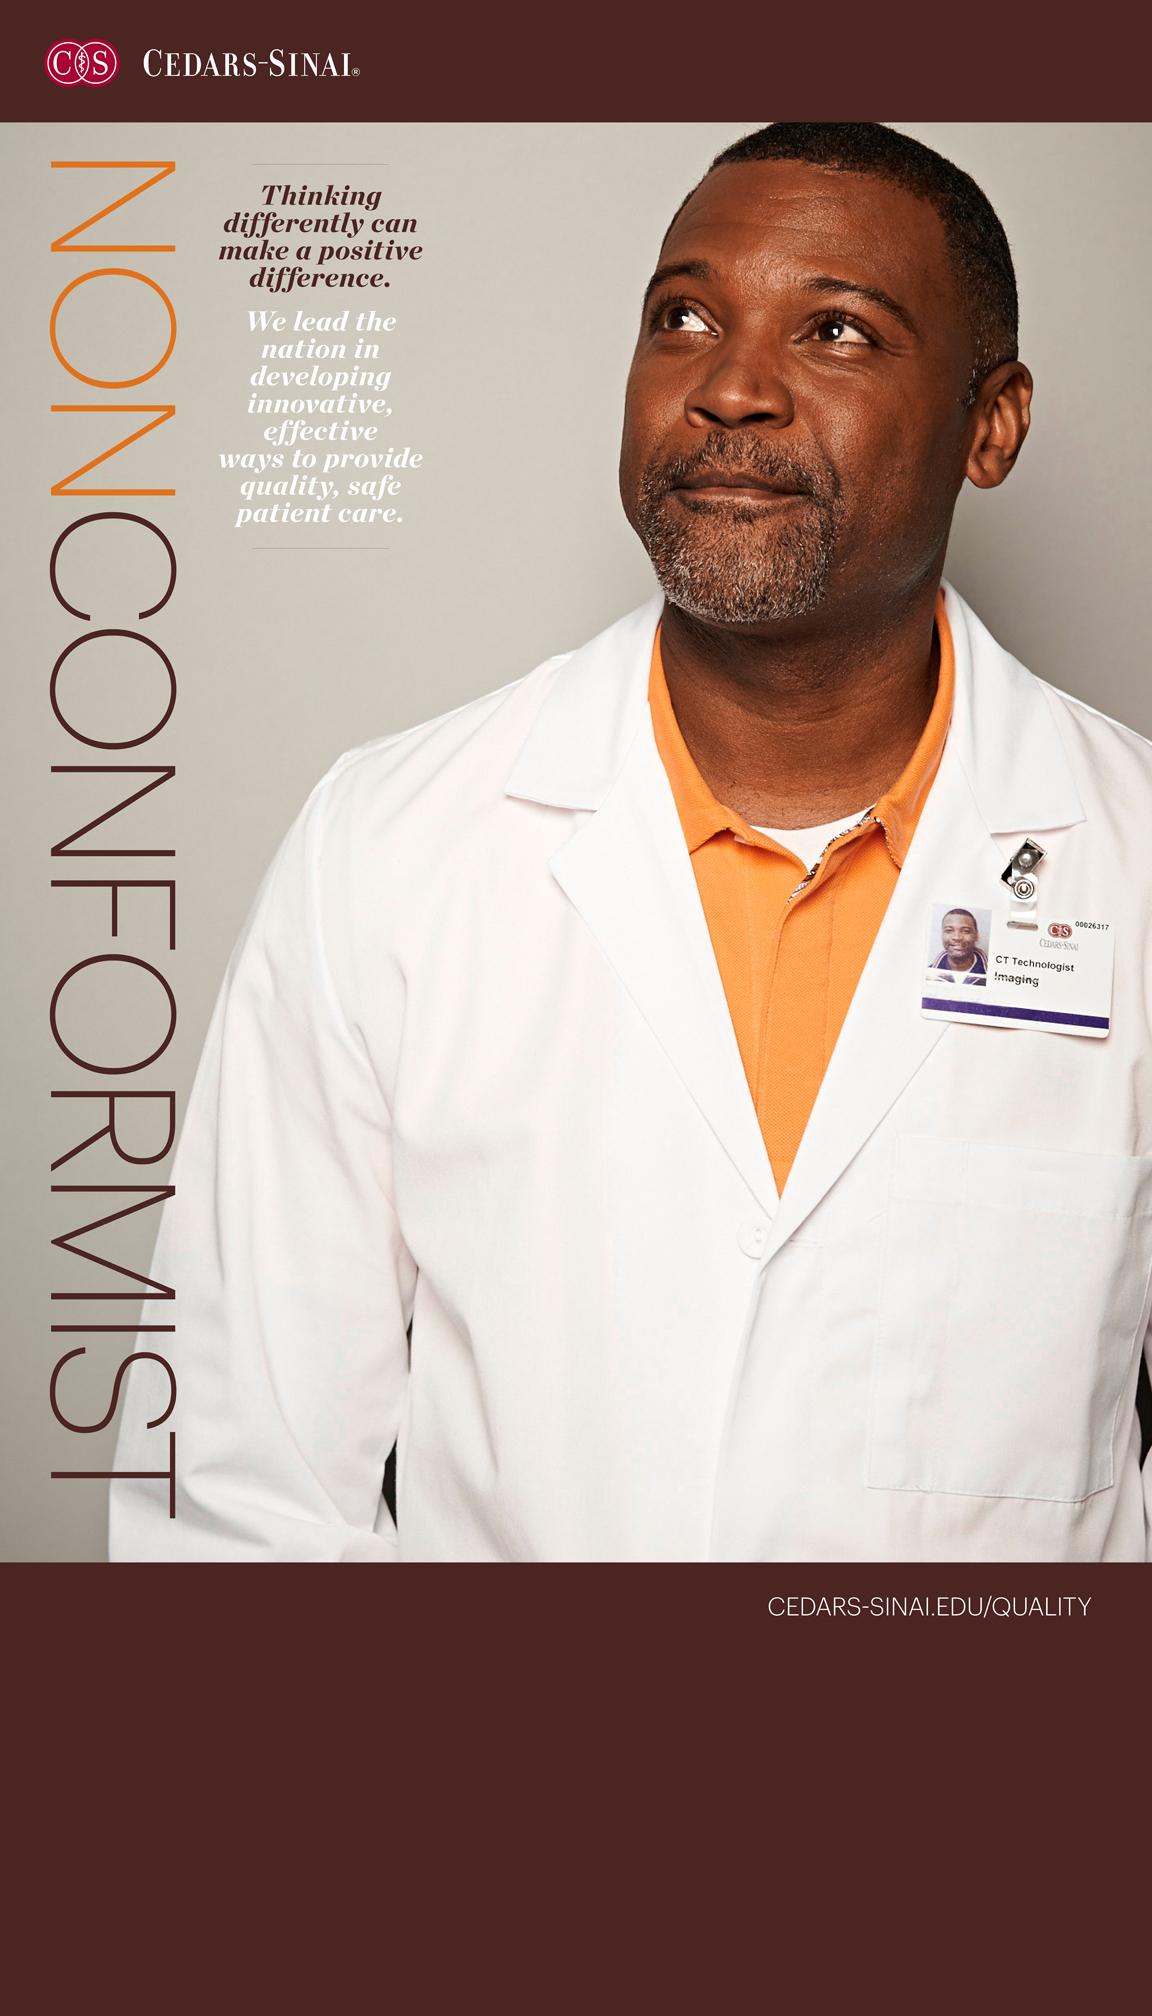 Cedars-Sinai Medical Center on Behance